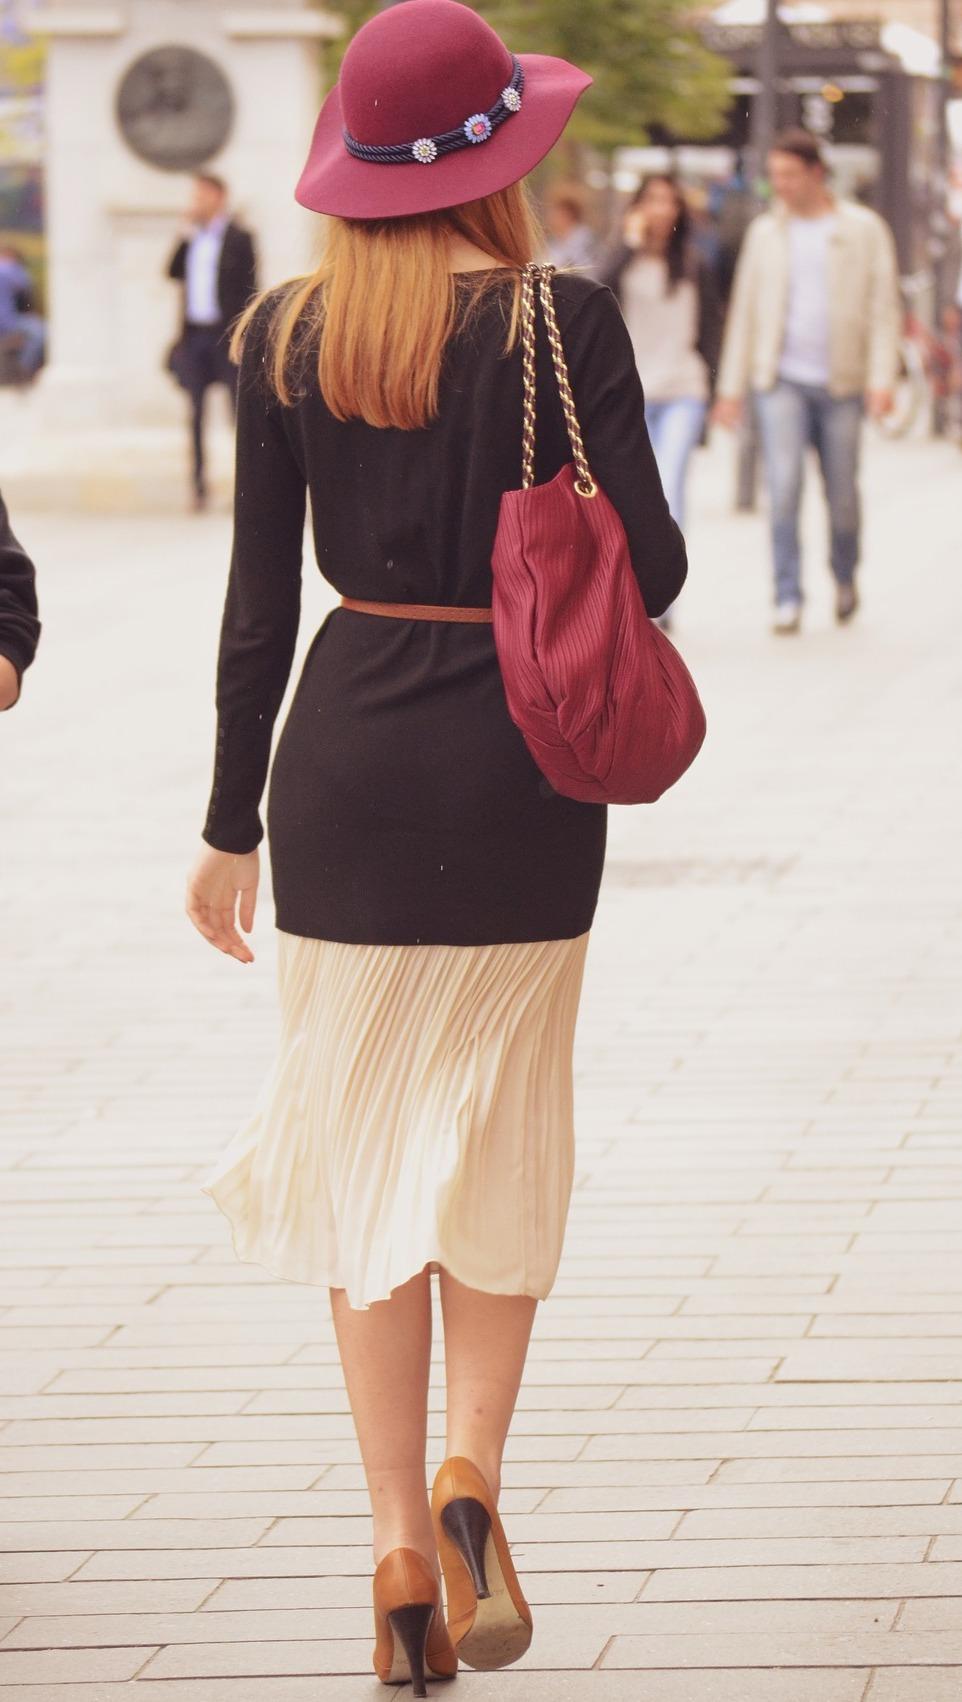 lady-walking-on-the-street